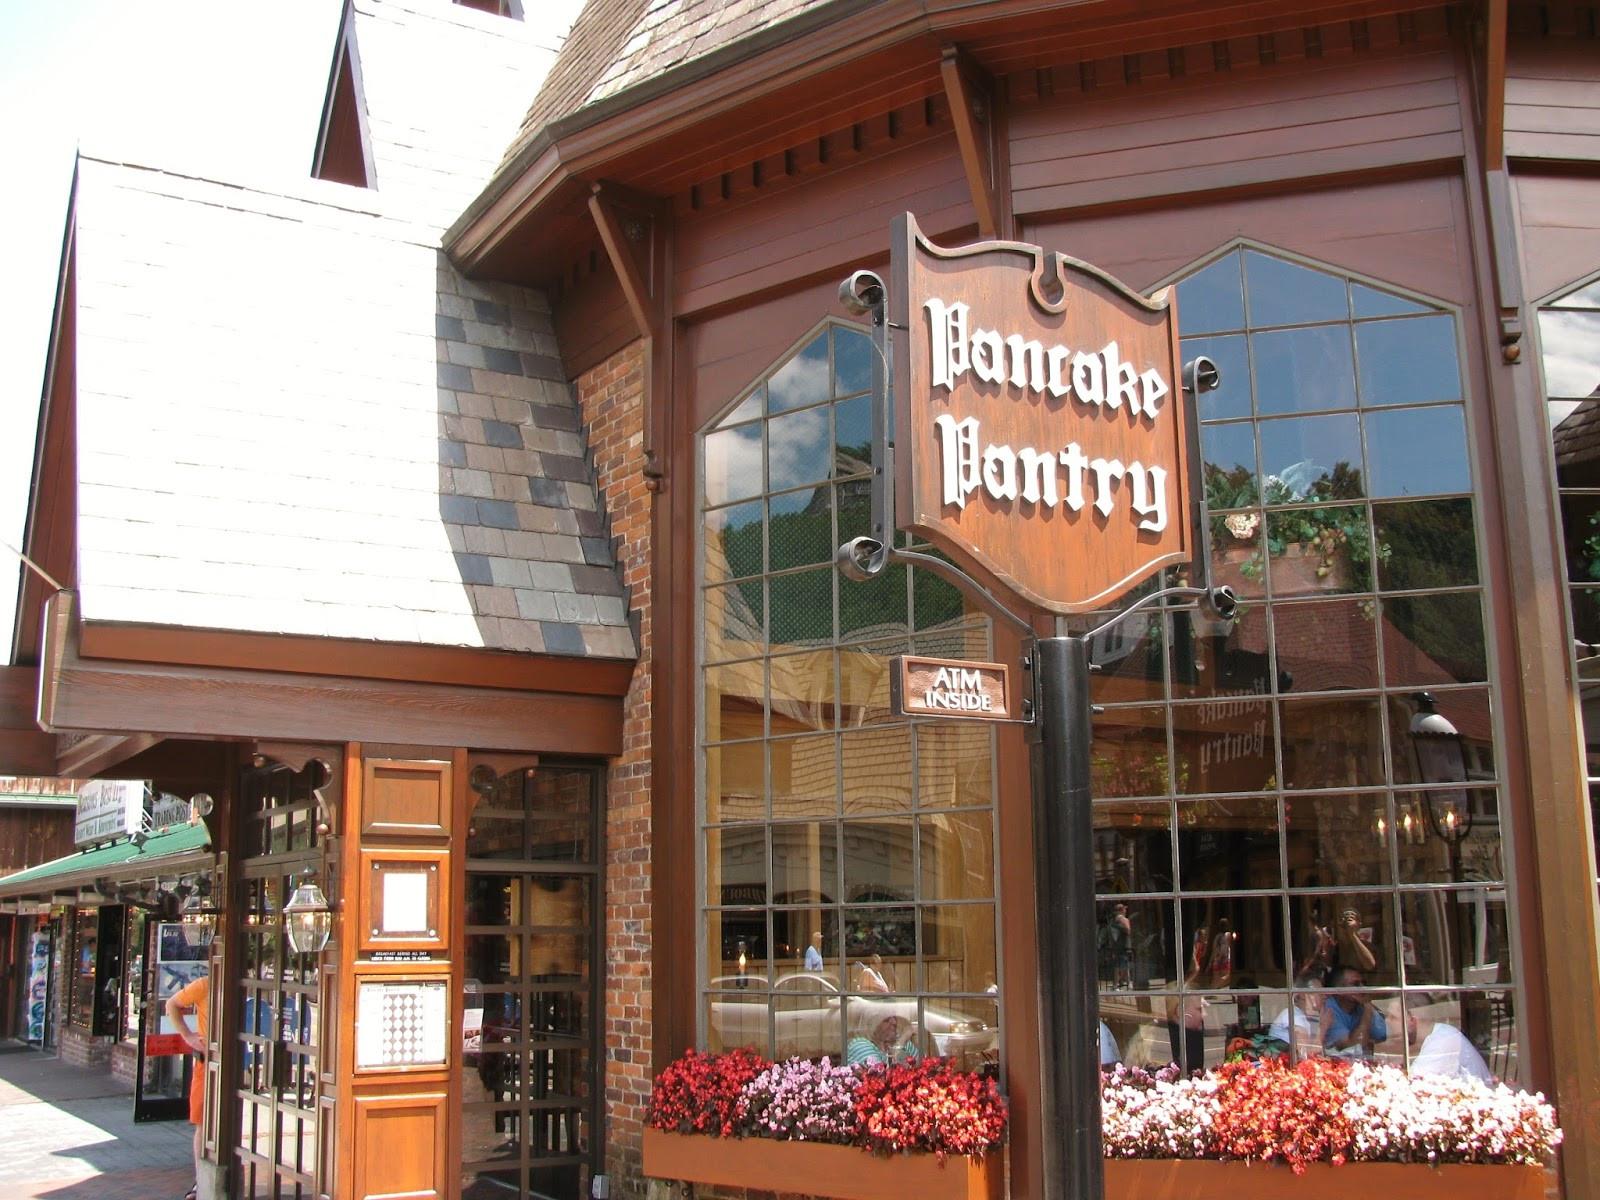 Best ideas about Pancake Pantry Gatlinburg Tn . Save or Pin Best 5 Pancake Houses in Gatlinburg The All Gatlinburg Blog Now.